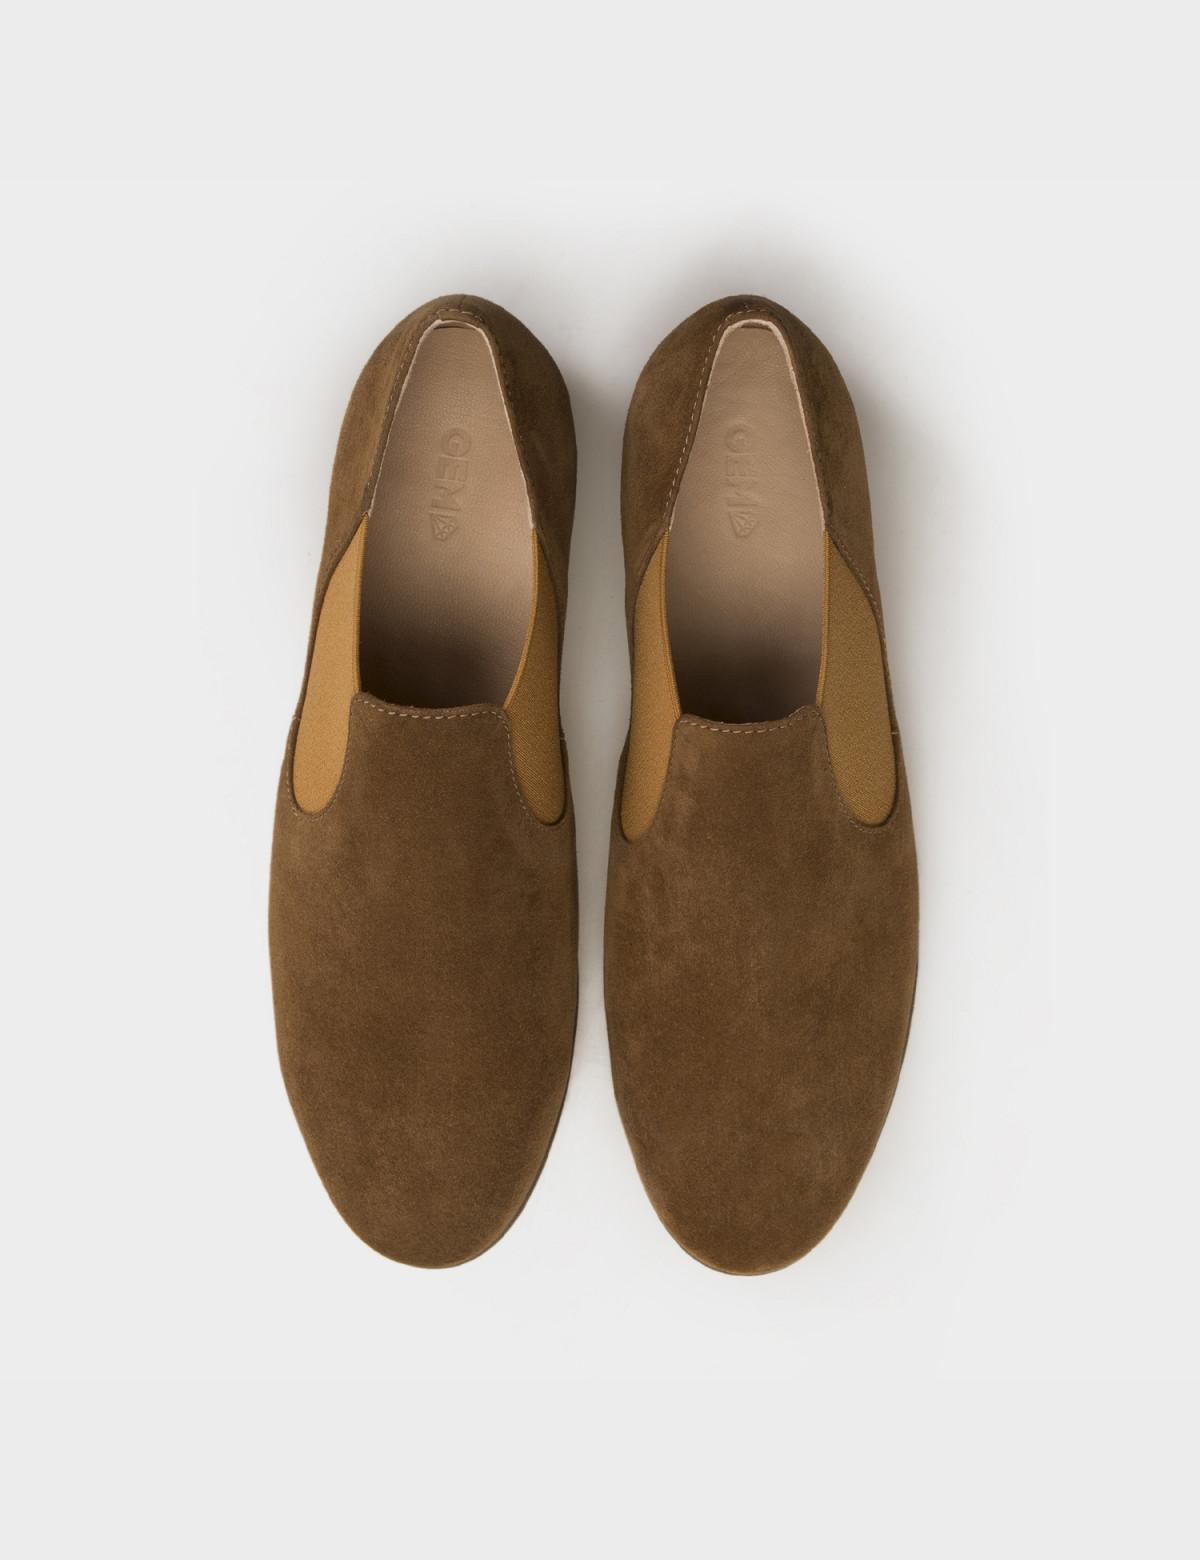 Туфли бежевые, натуральная замша3